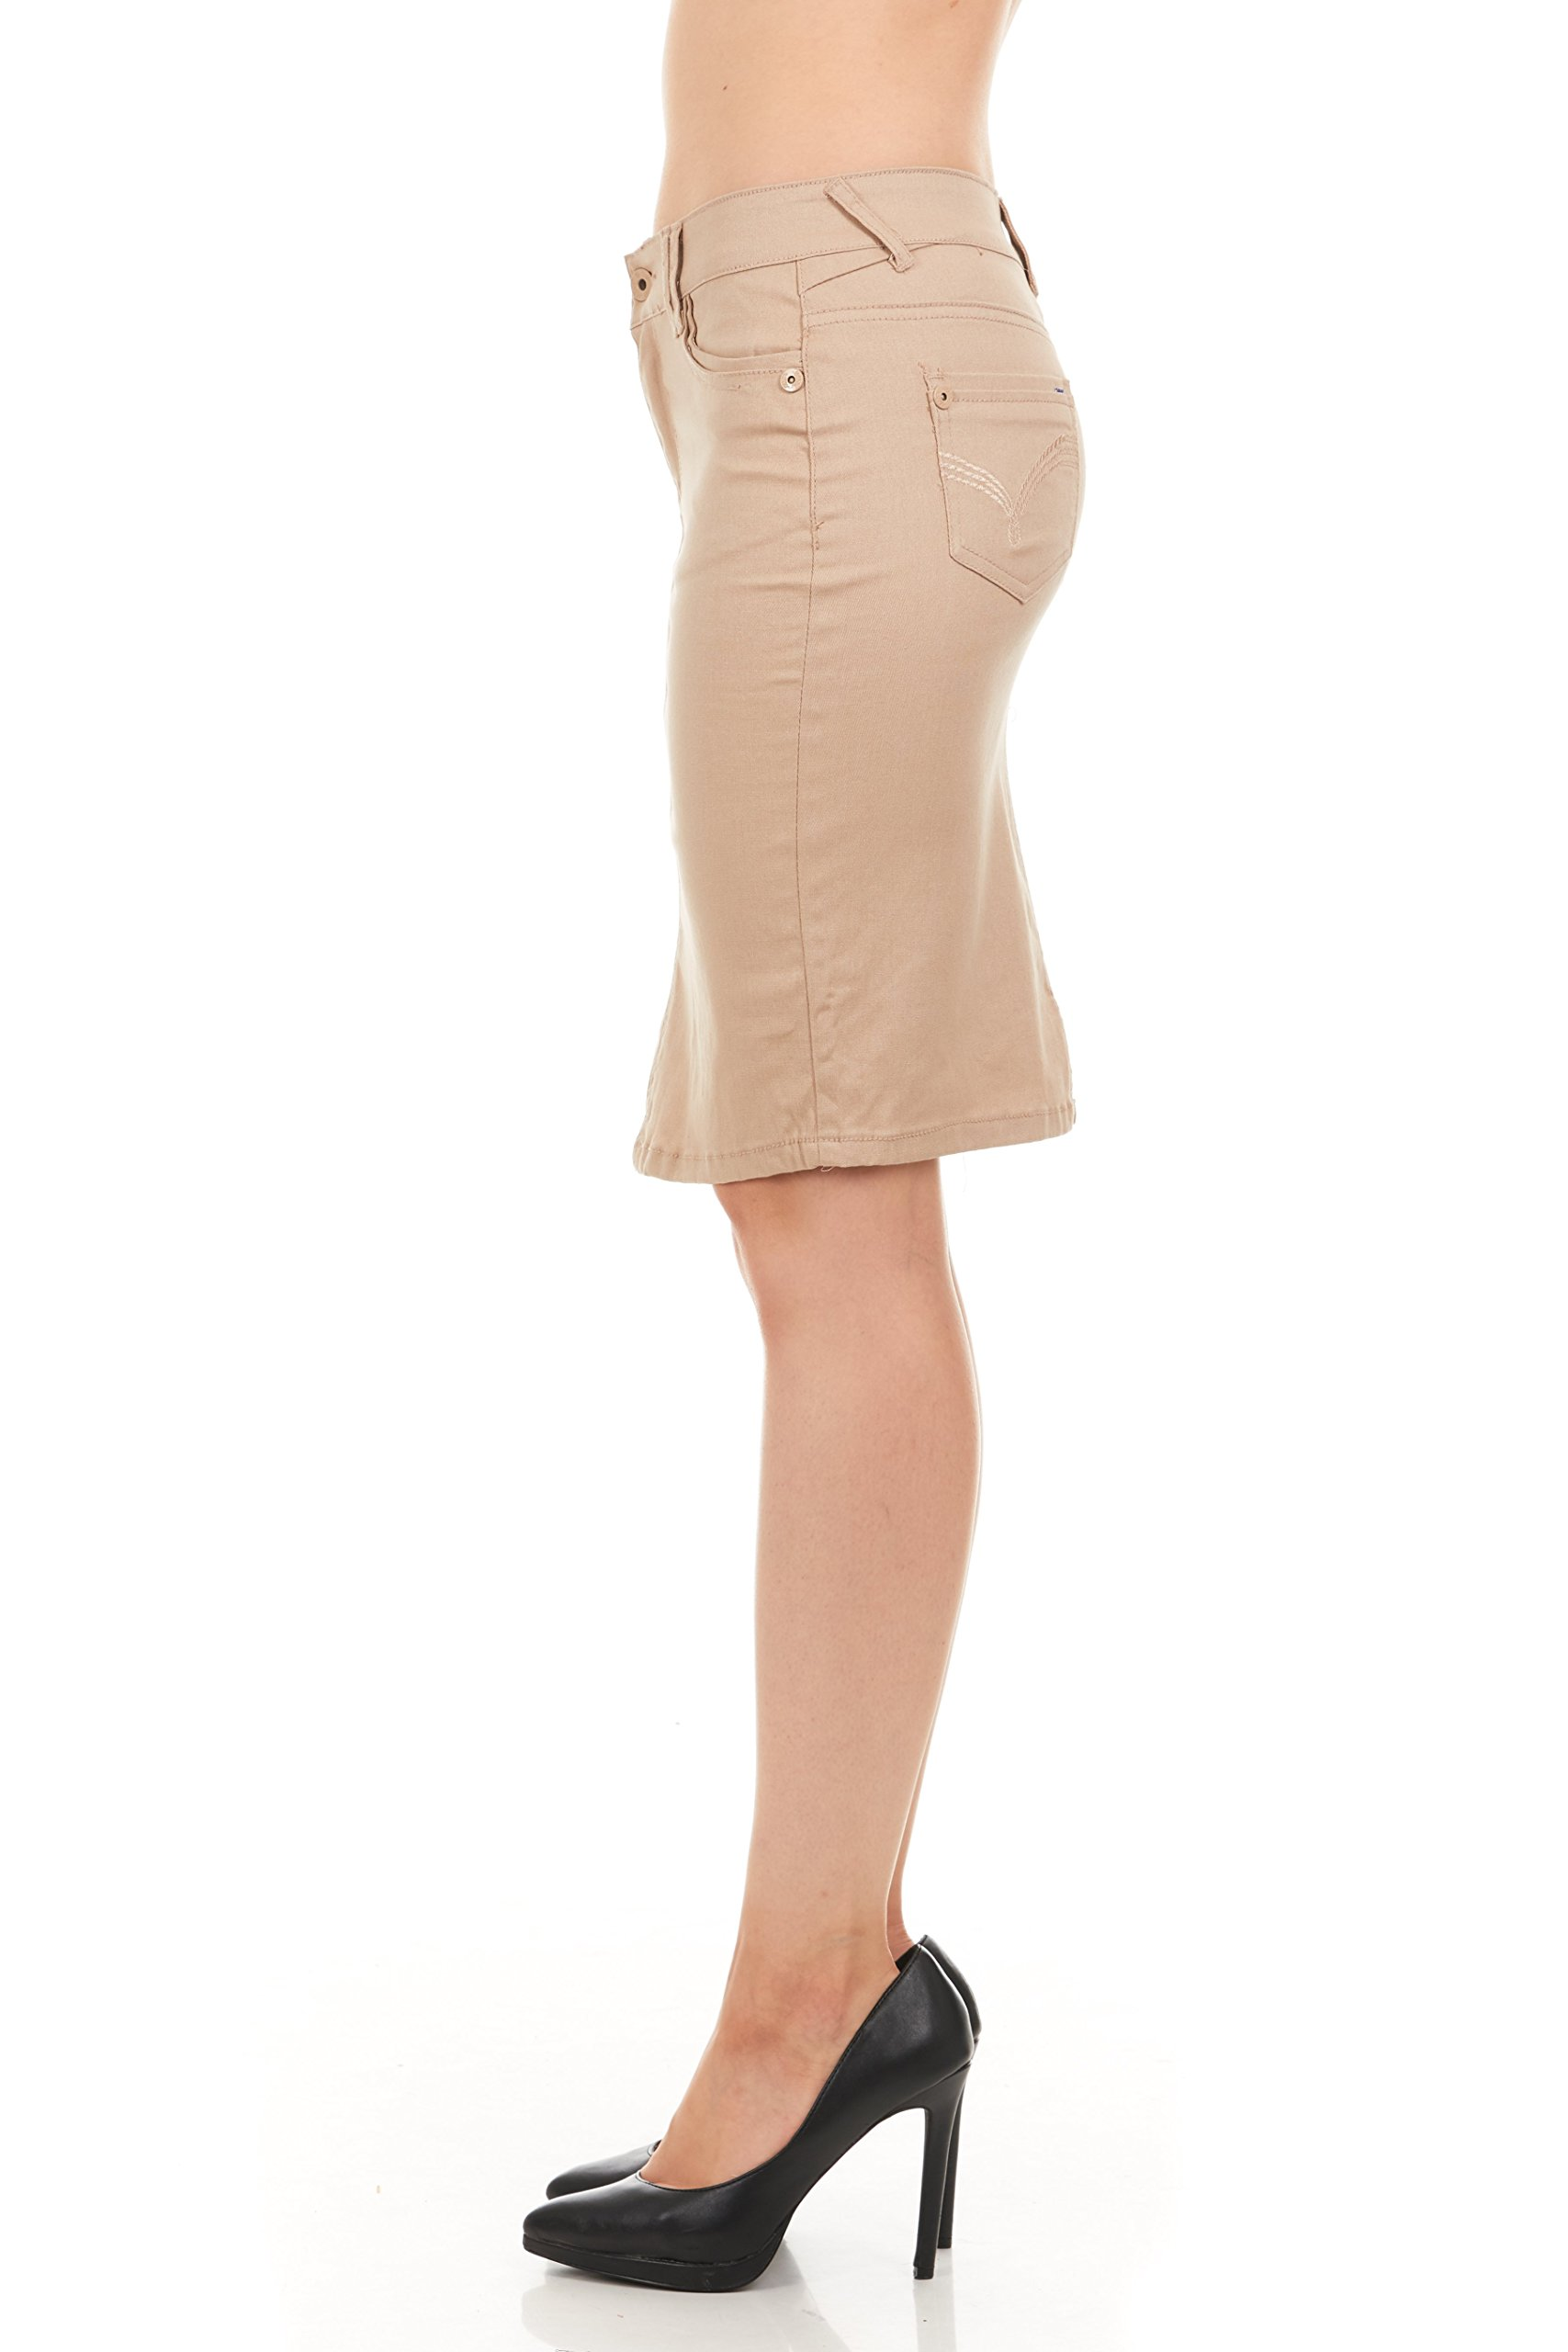 FGR Girl's Stertchy Cotton 5 Pocket Color Denim Skirt Khaki Size 12 by FGR (Image #8)